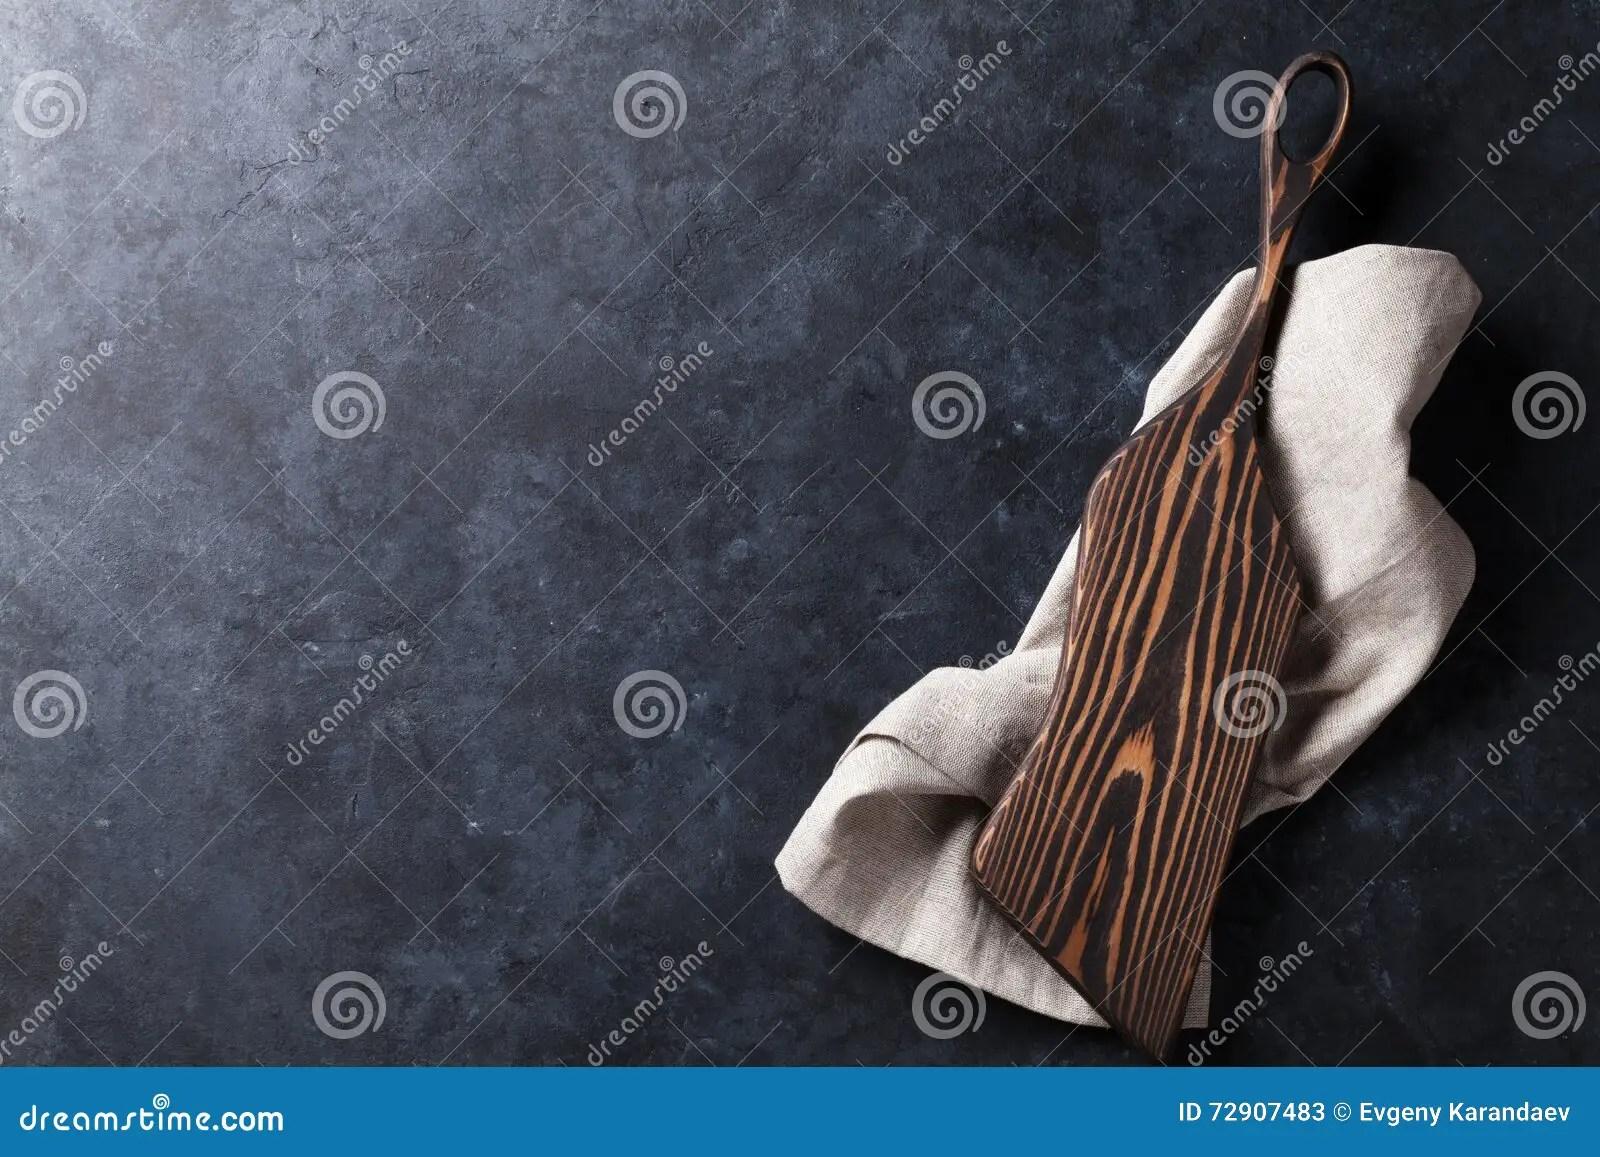 towel for kitchen remodeled small kitchens 与切板的厨房用桌在毛巾库存图片 图片包括有菜单 大理石 顶层 烹饪 与切板的厨房用桌在毛巾